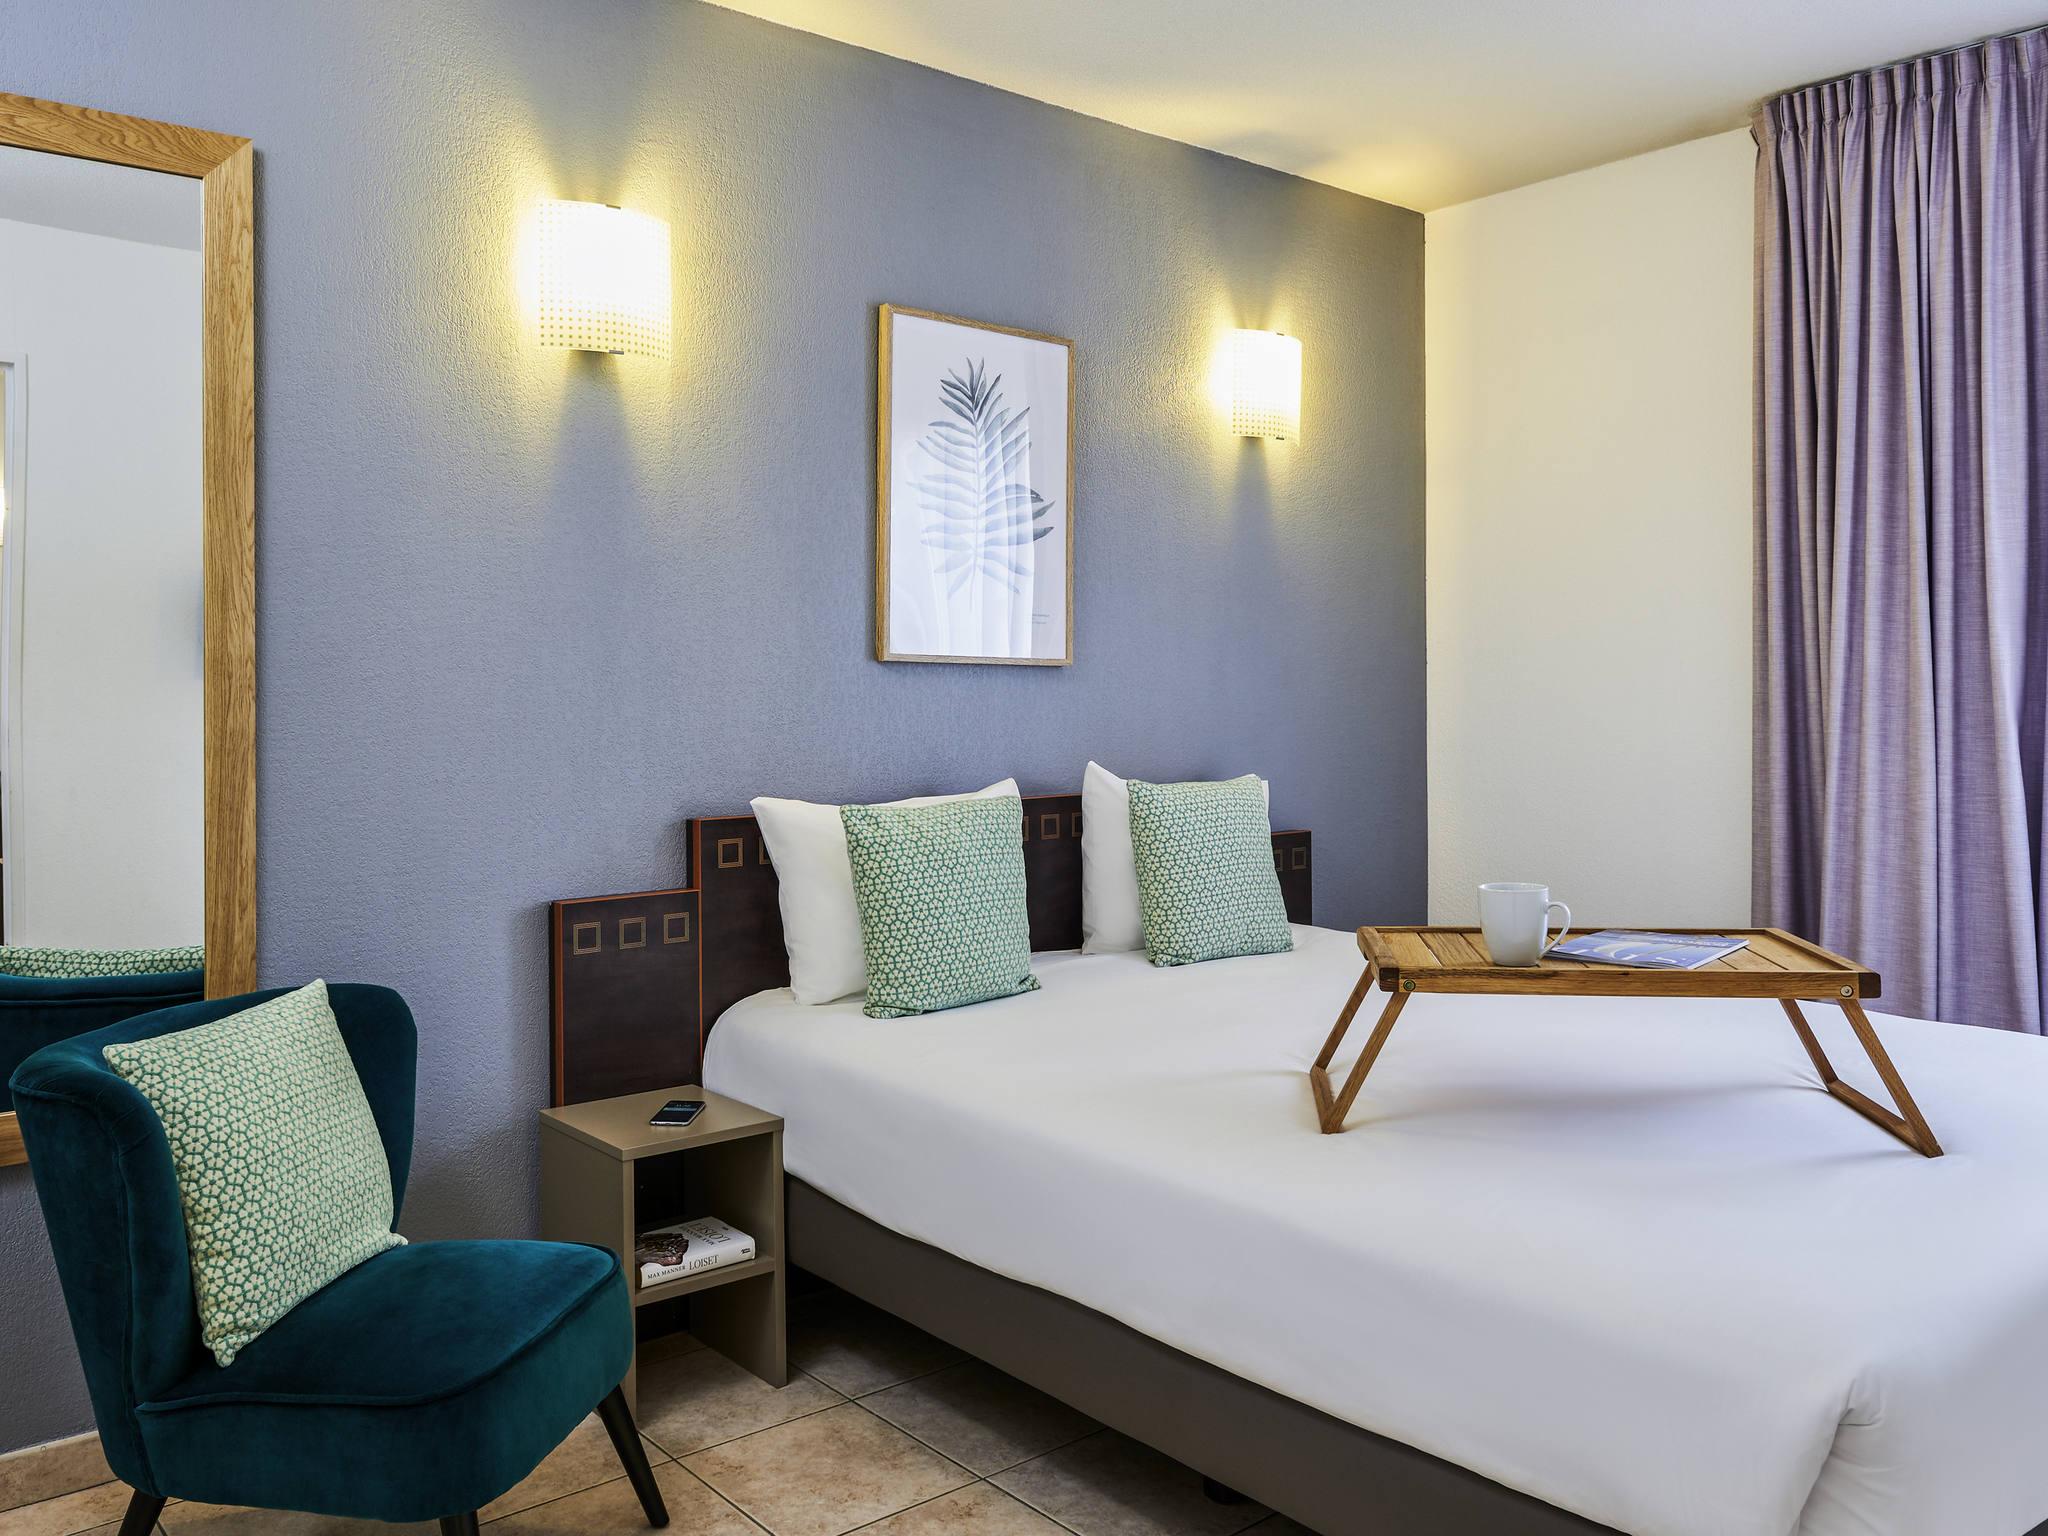 Hôtel - Aparthotel Adagio access Nice Acropolis